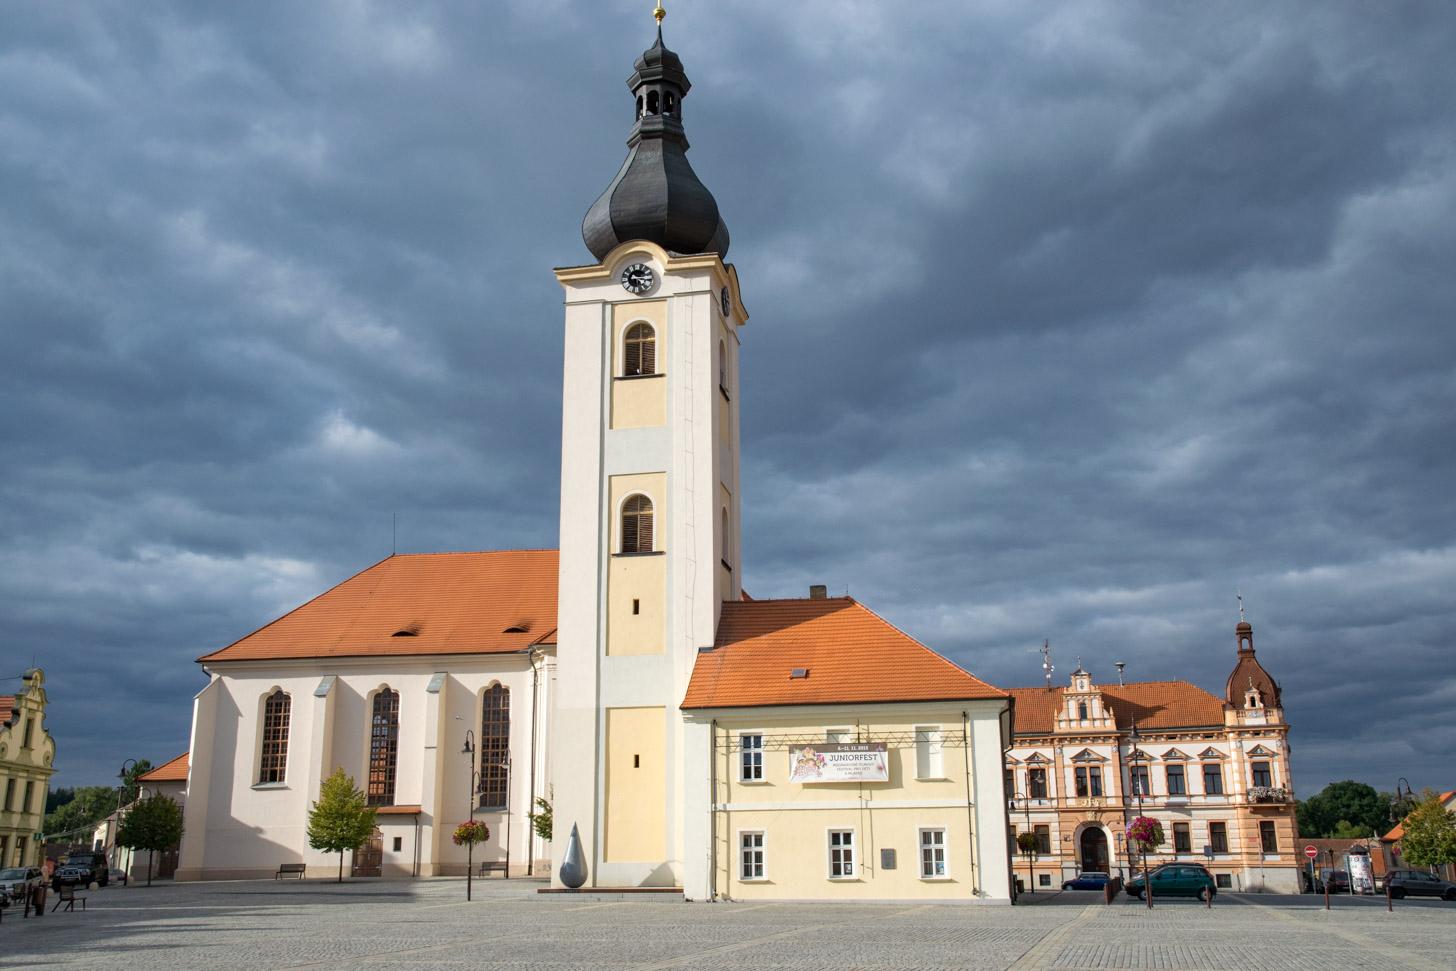 Een mooi dorp in Tsjechië